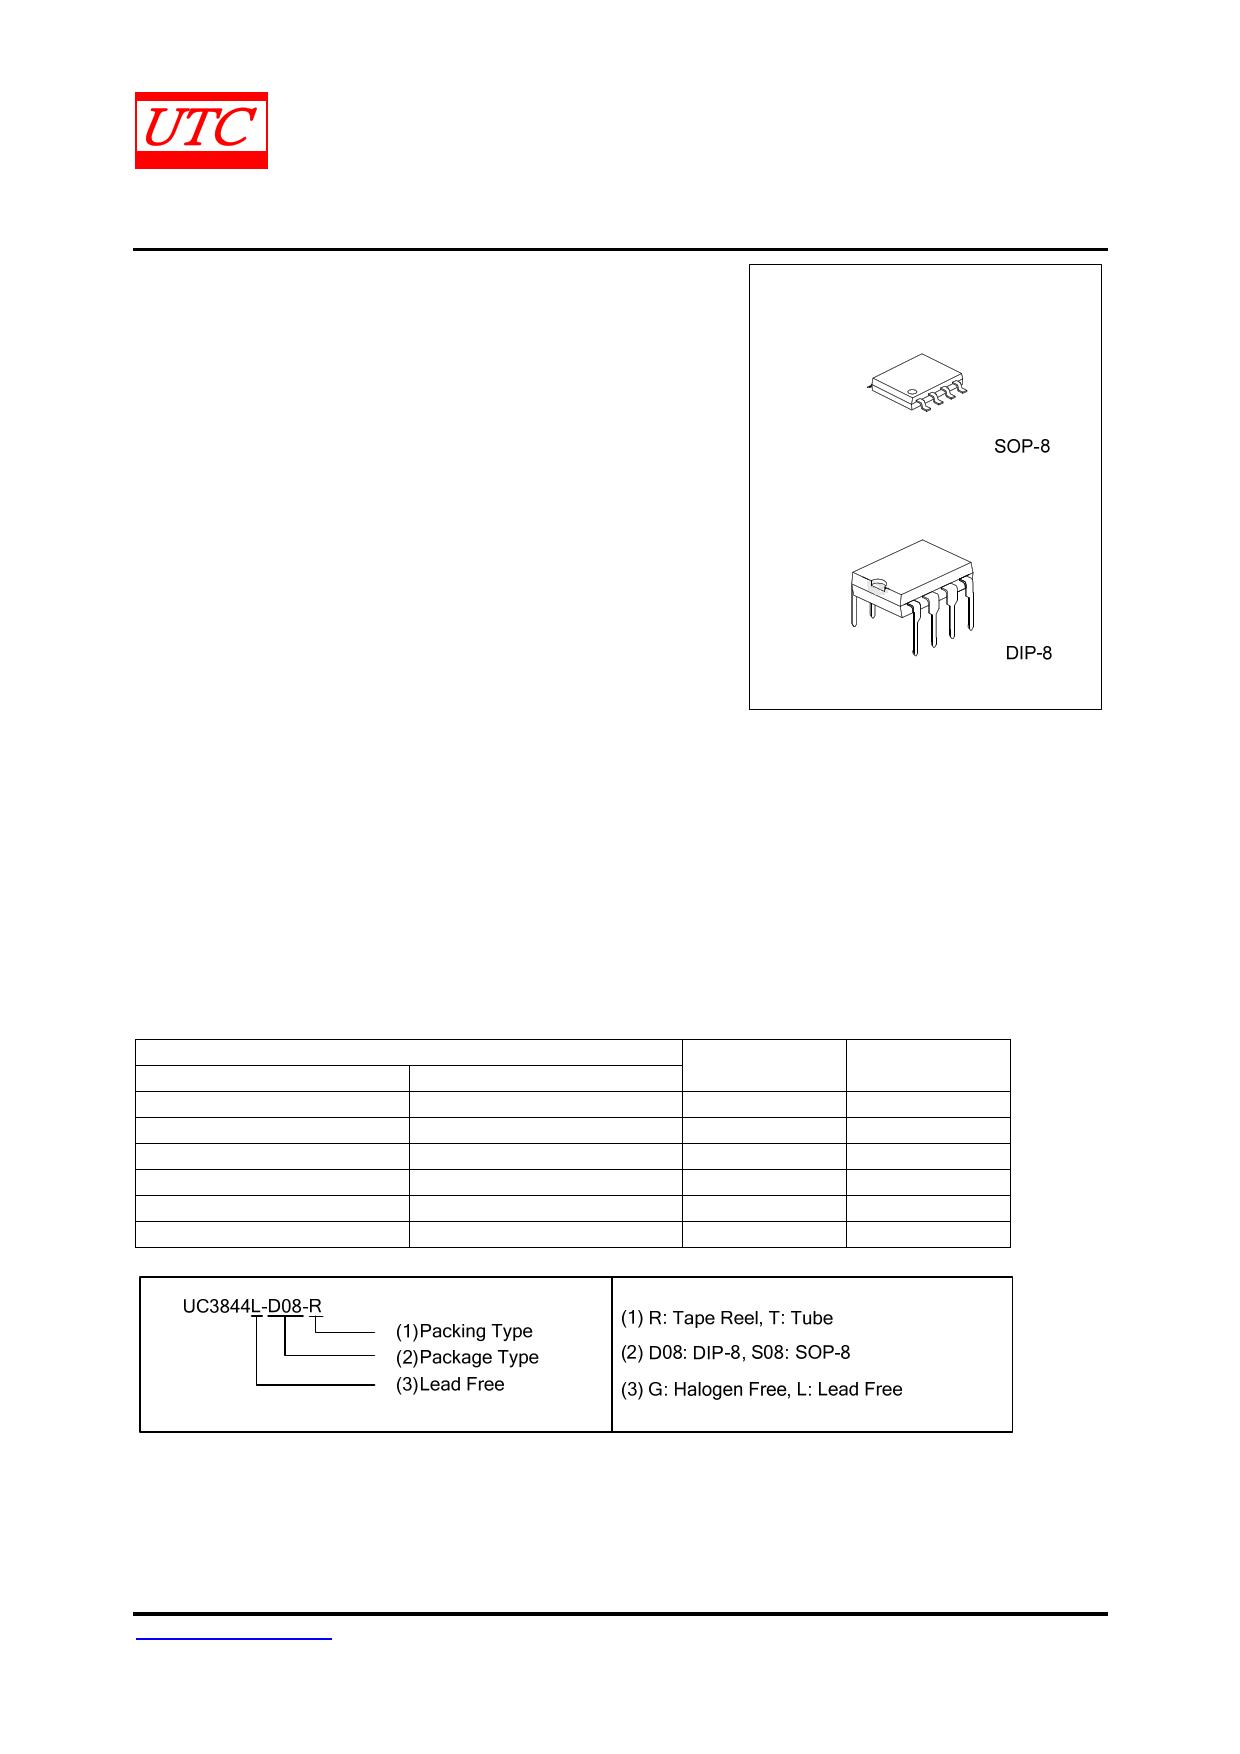 Uc3844 datasheet